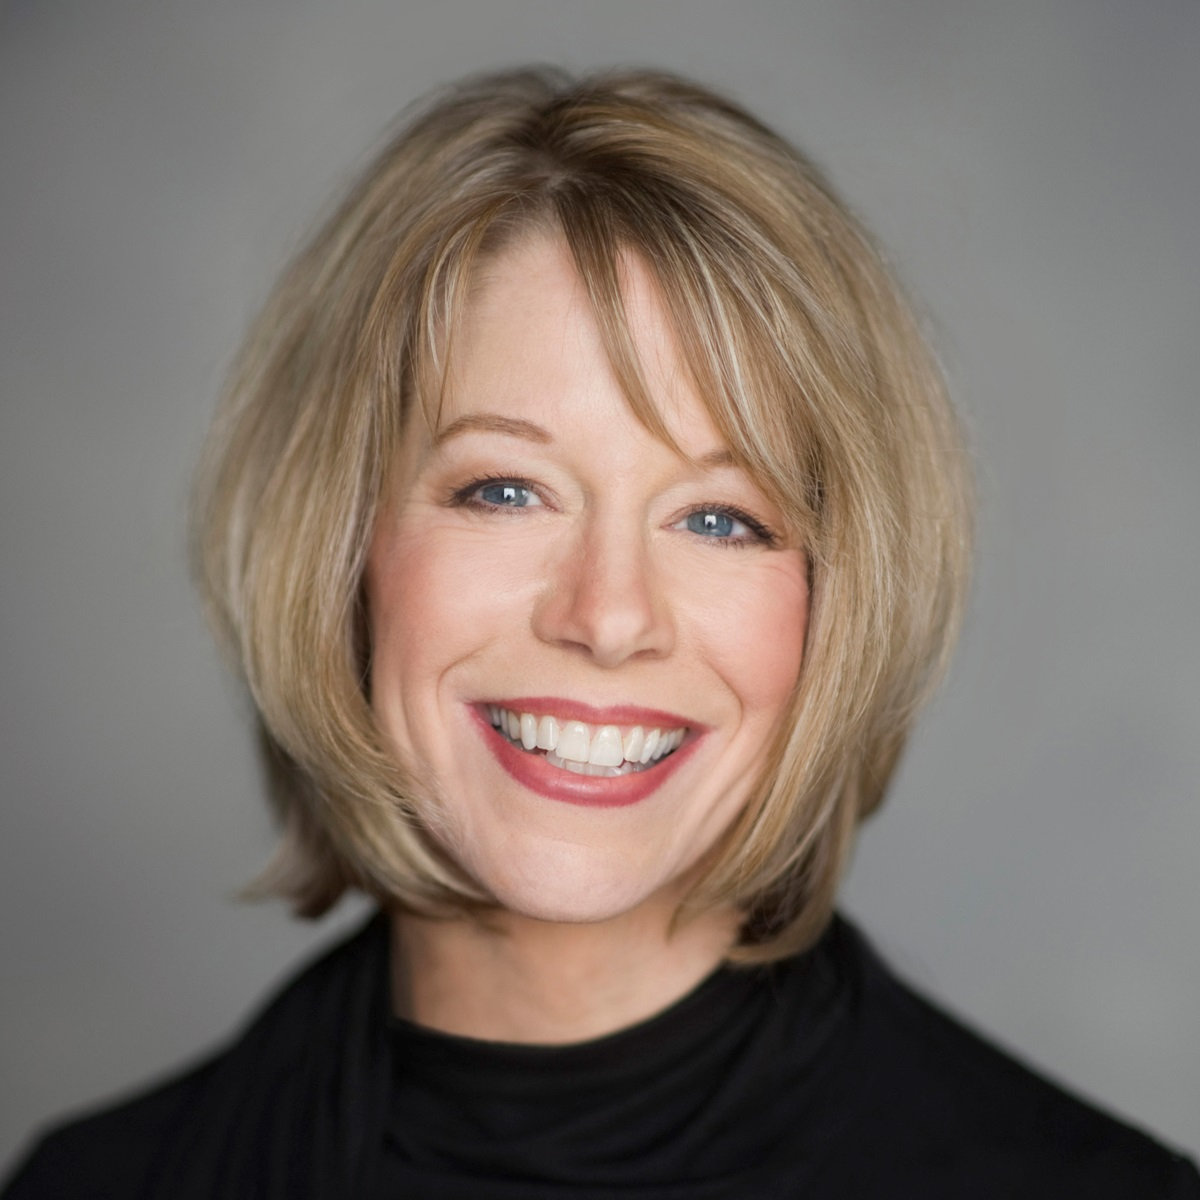 Elizabeth Longhurst, soprano